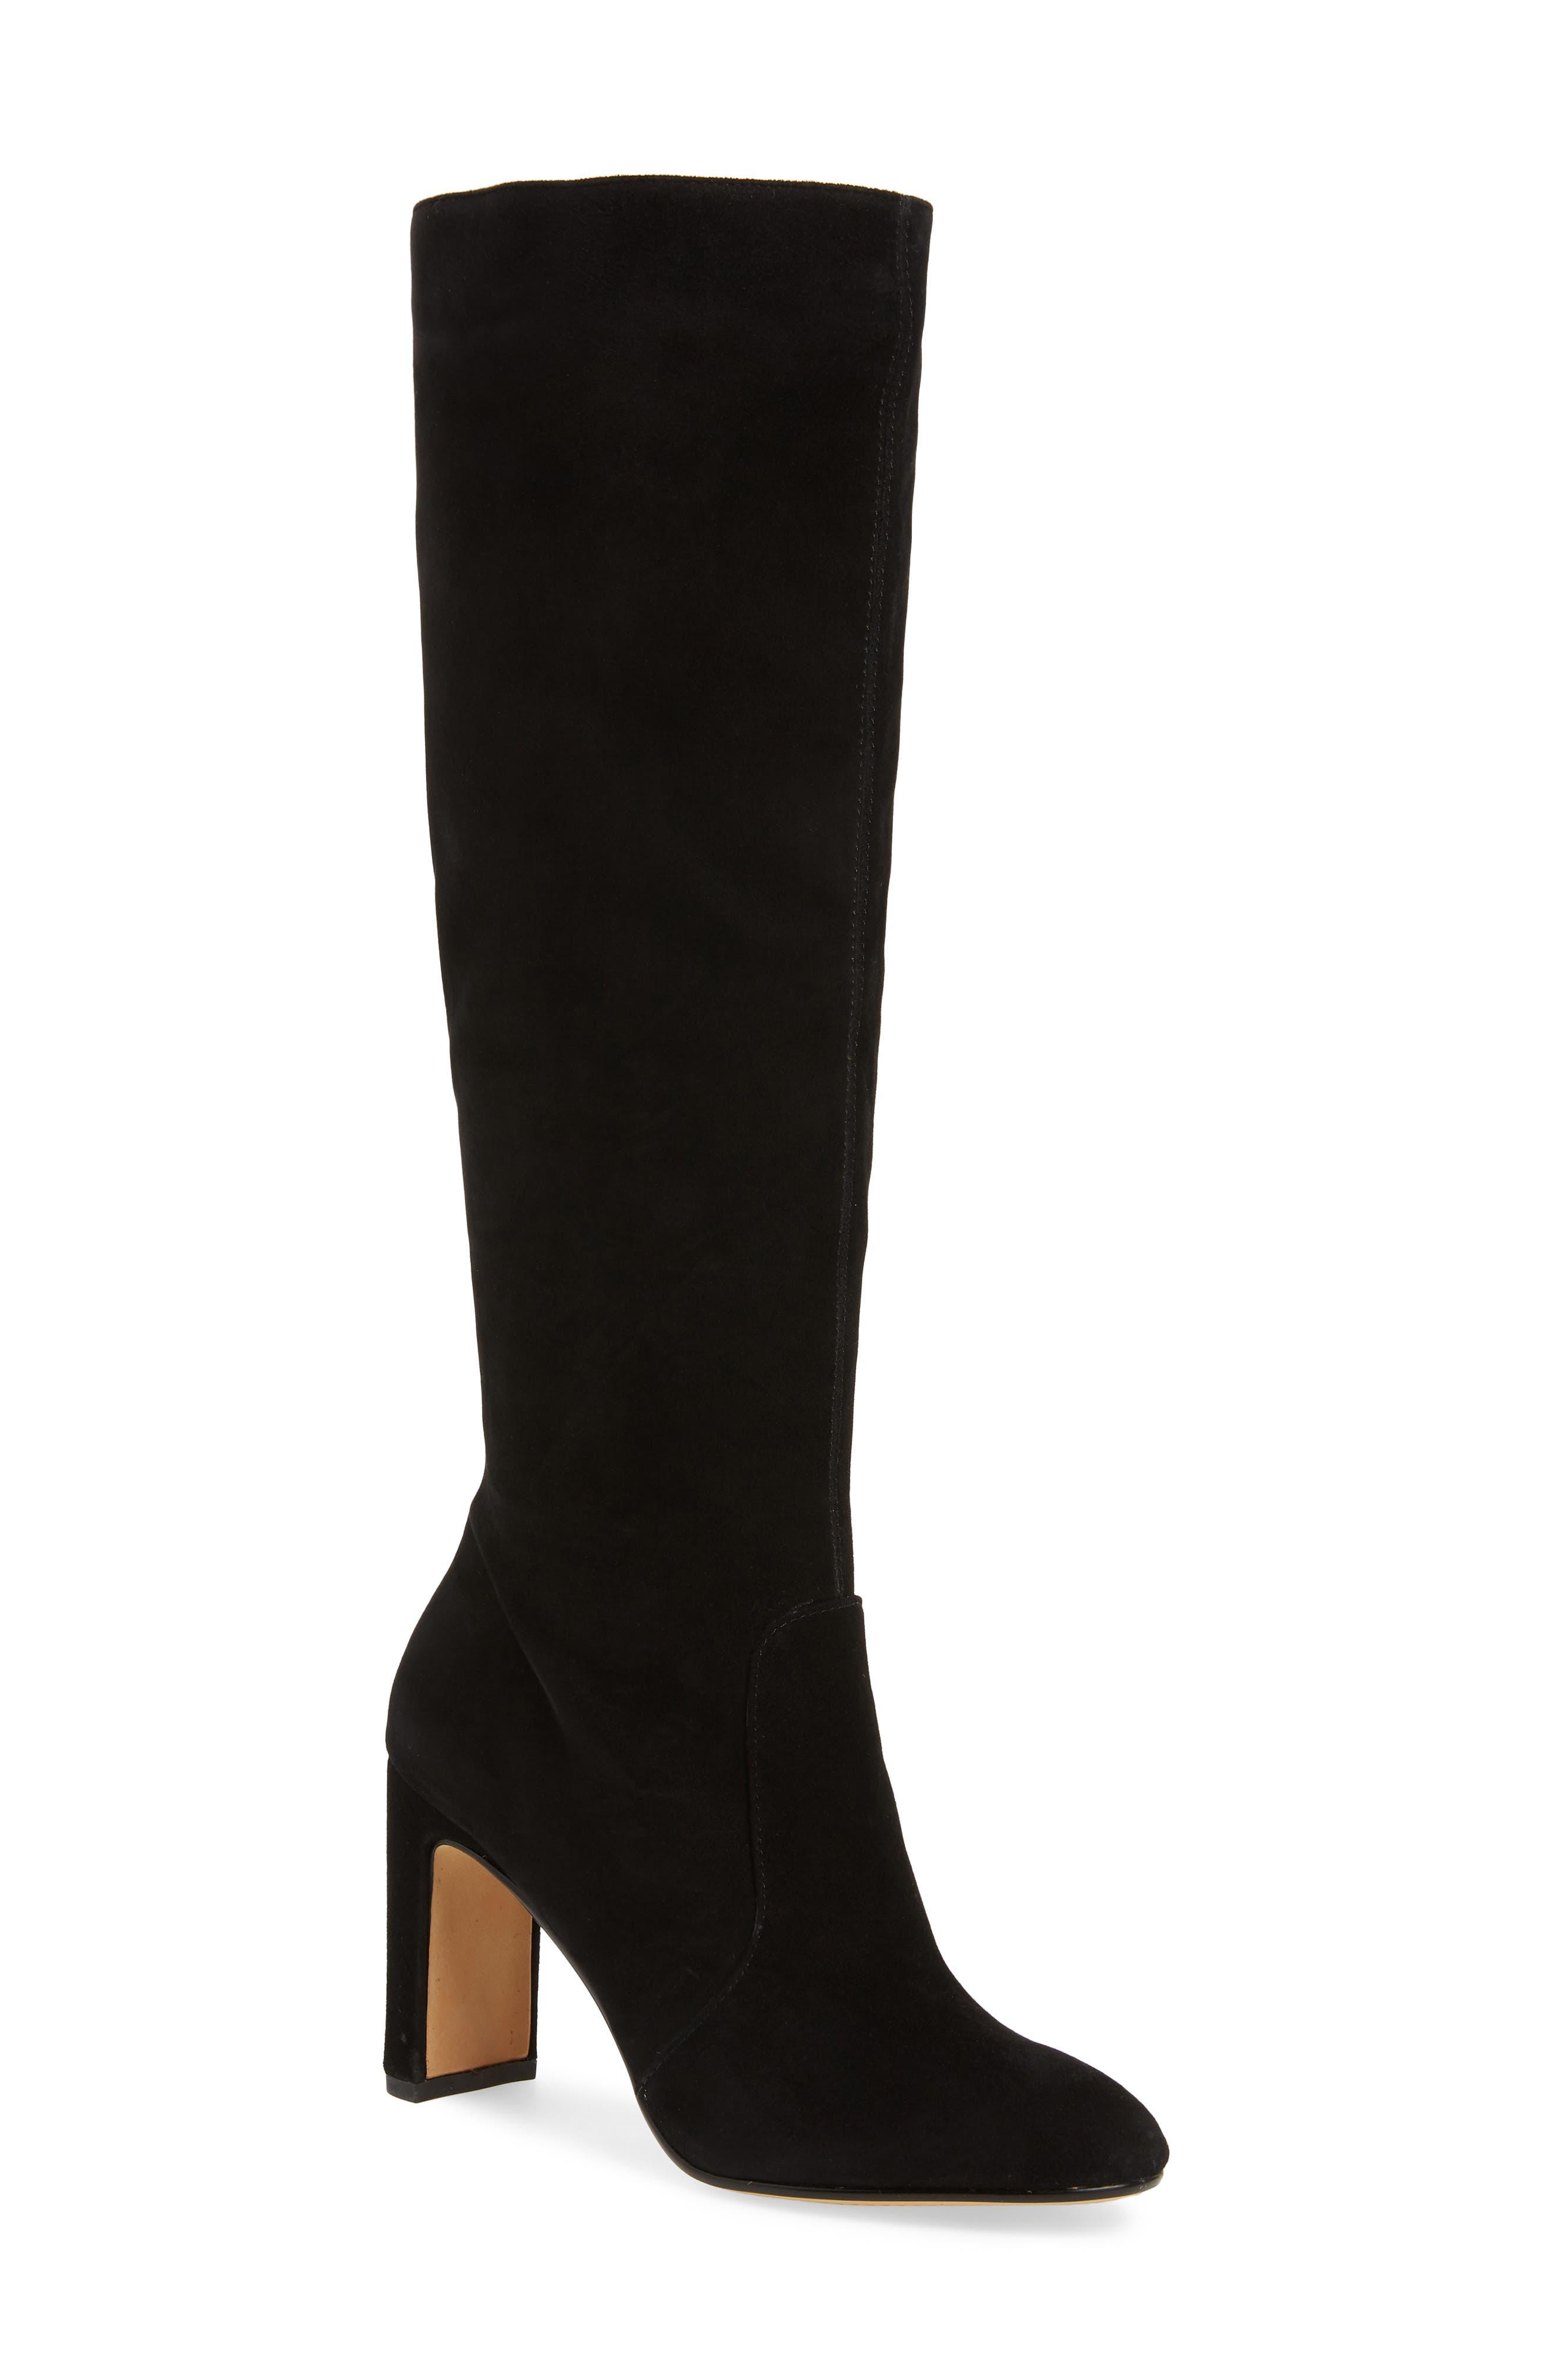 Dolce Vita Coop Knee High Boot, Black